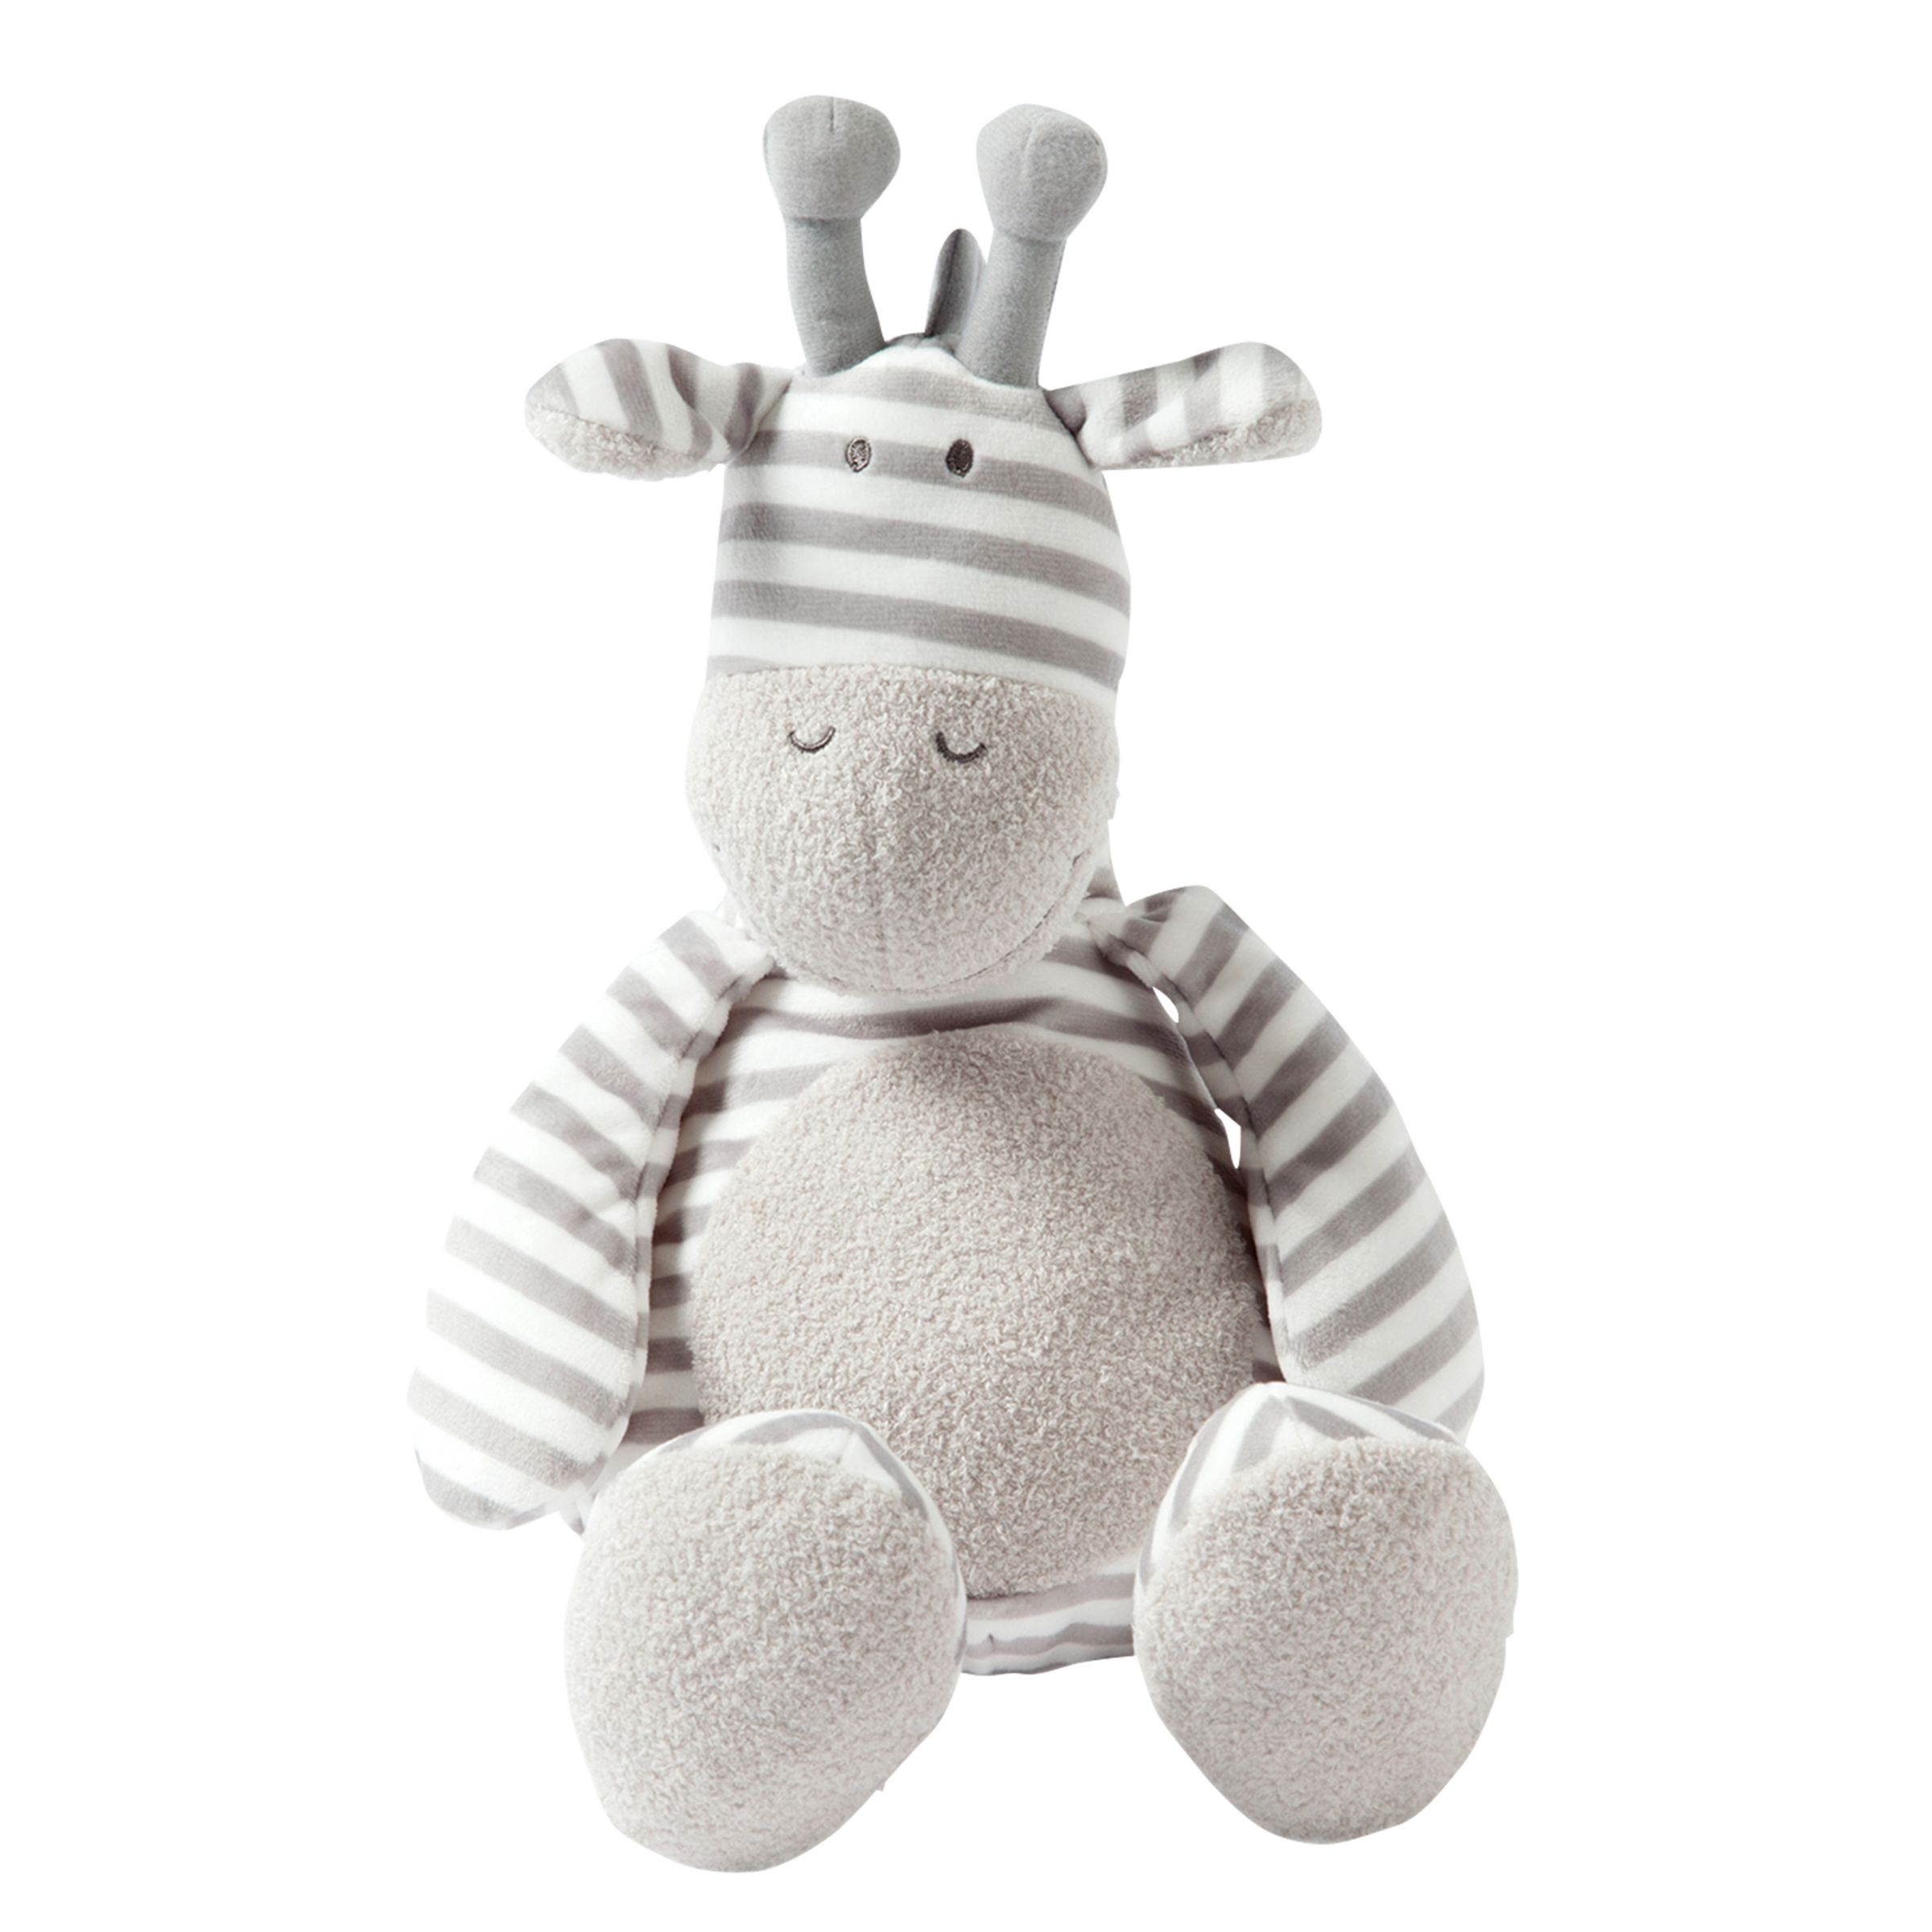 Manhattan Toy Manhattan Toy Giggle Giraffe Soft Toy, Large